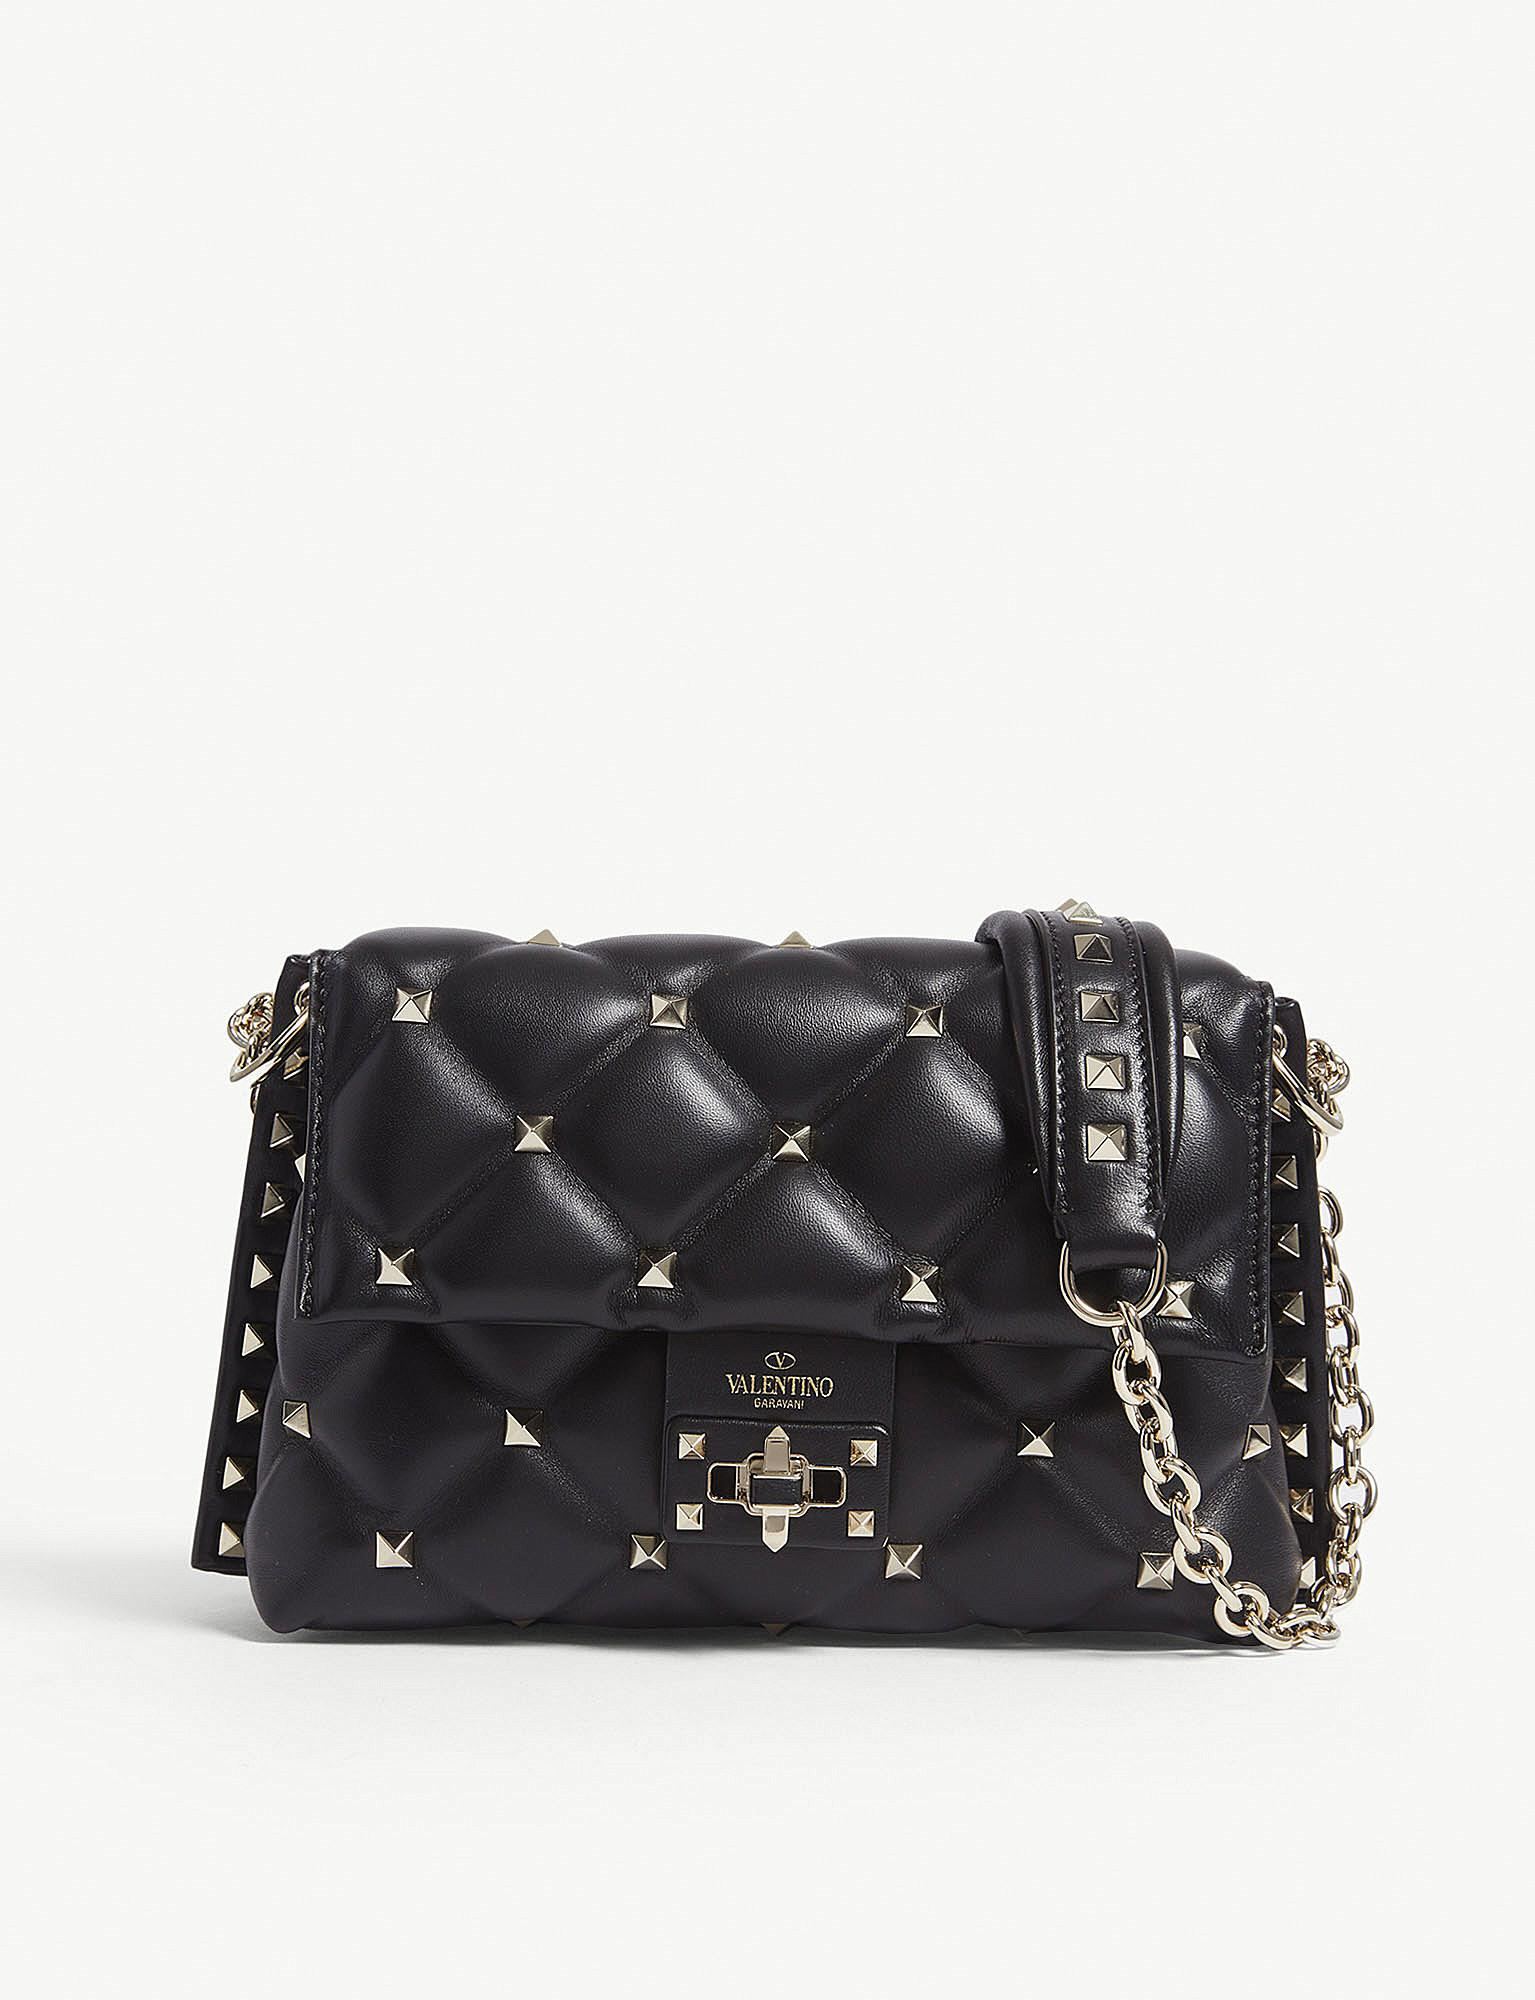 60ac5bc6b479 Valentino Black Candy Rockstud Leather Cross Body Bag in Black - Lyst